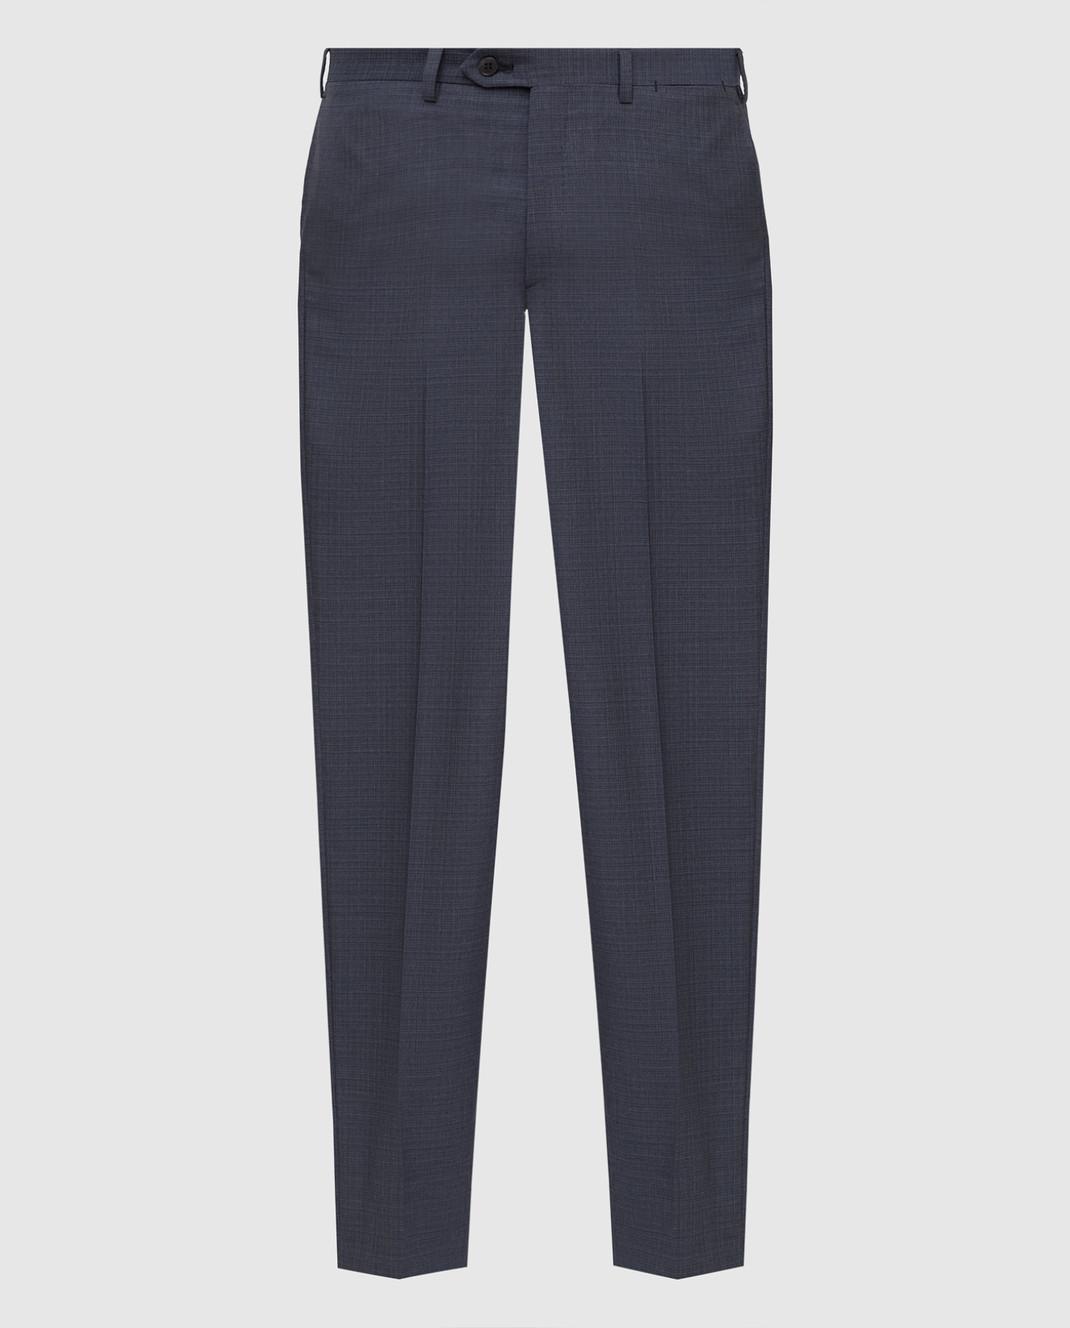 Brioni Темно-серые брюки из шерсти RPL80PP7AW7